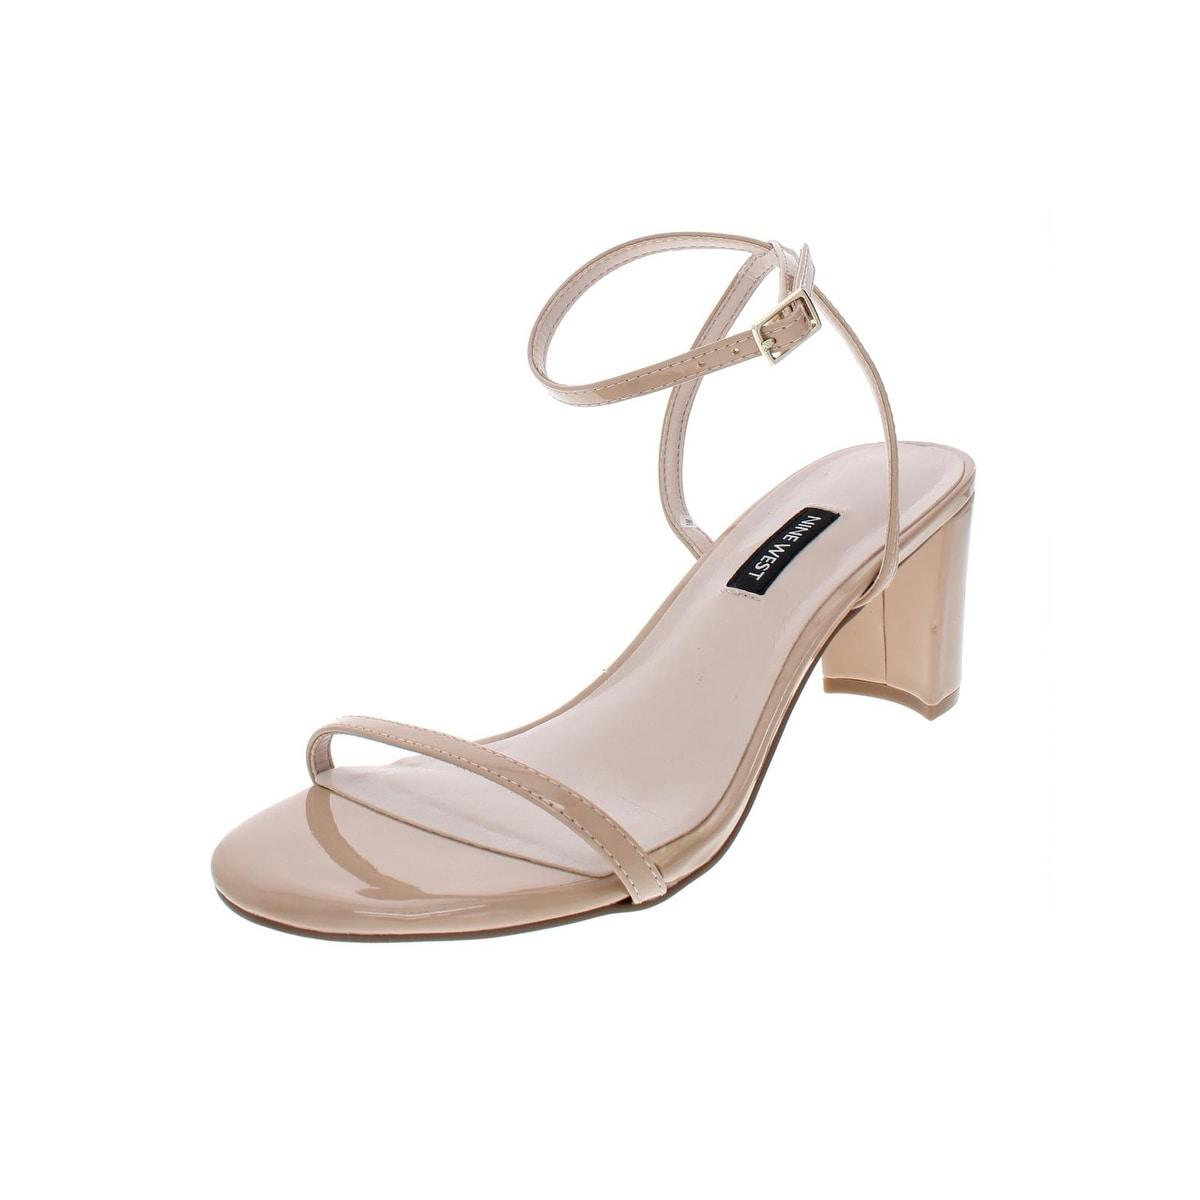 3917a7d5ba Buy Nine West Women's Sandals Online at Overstock   Our Best Women's Shoes  Deals